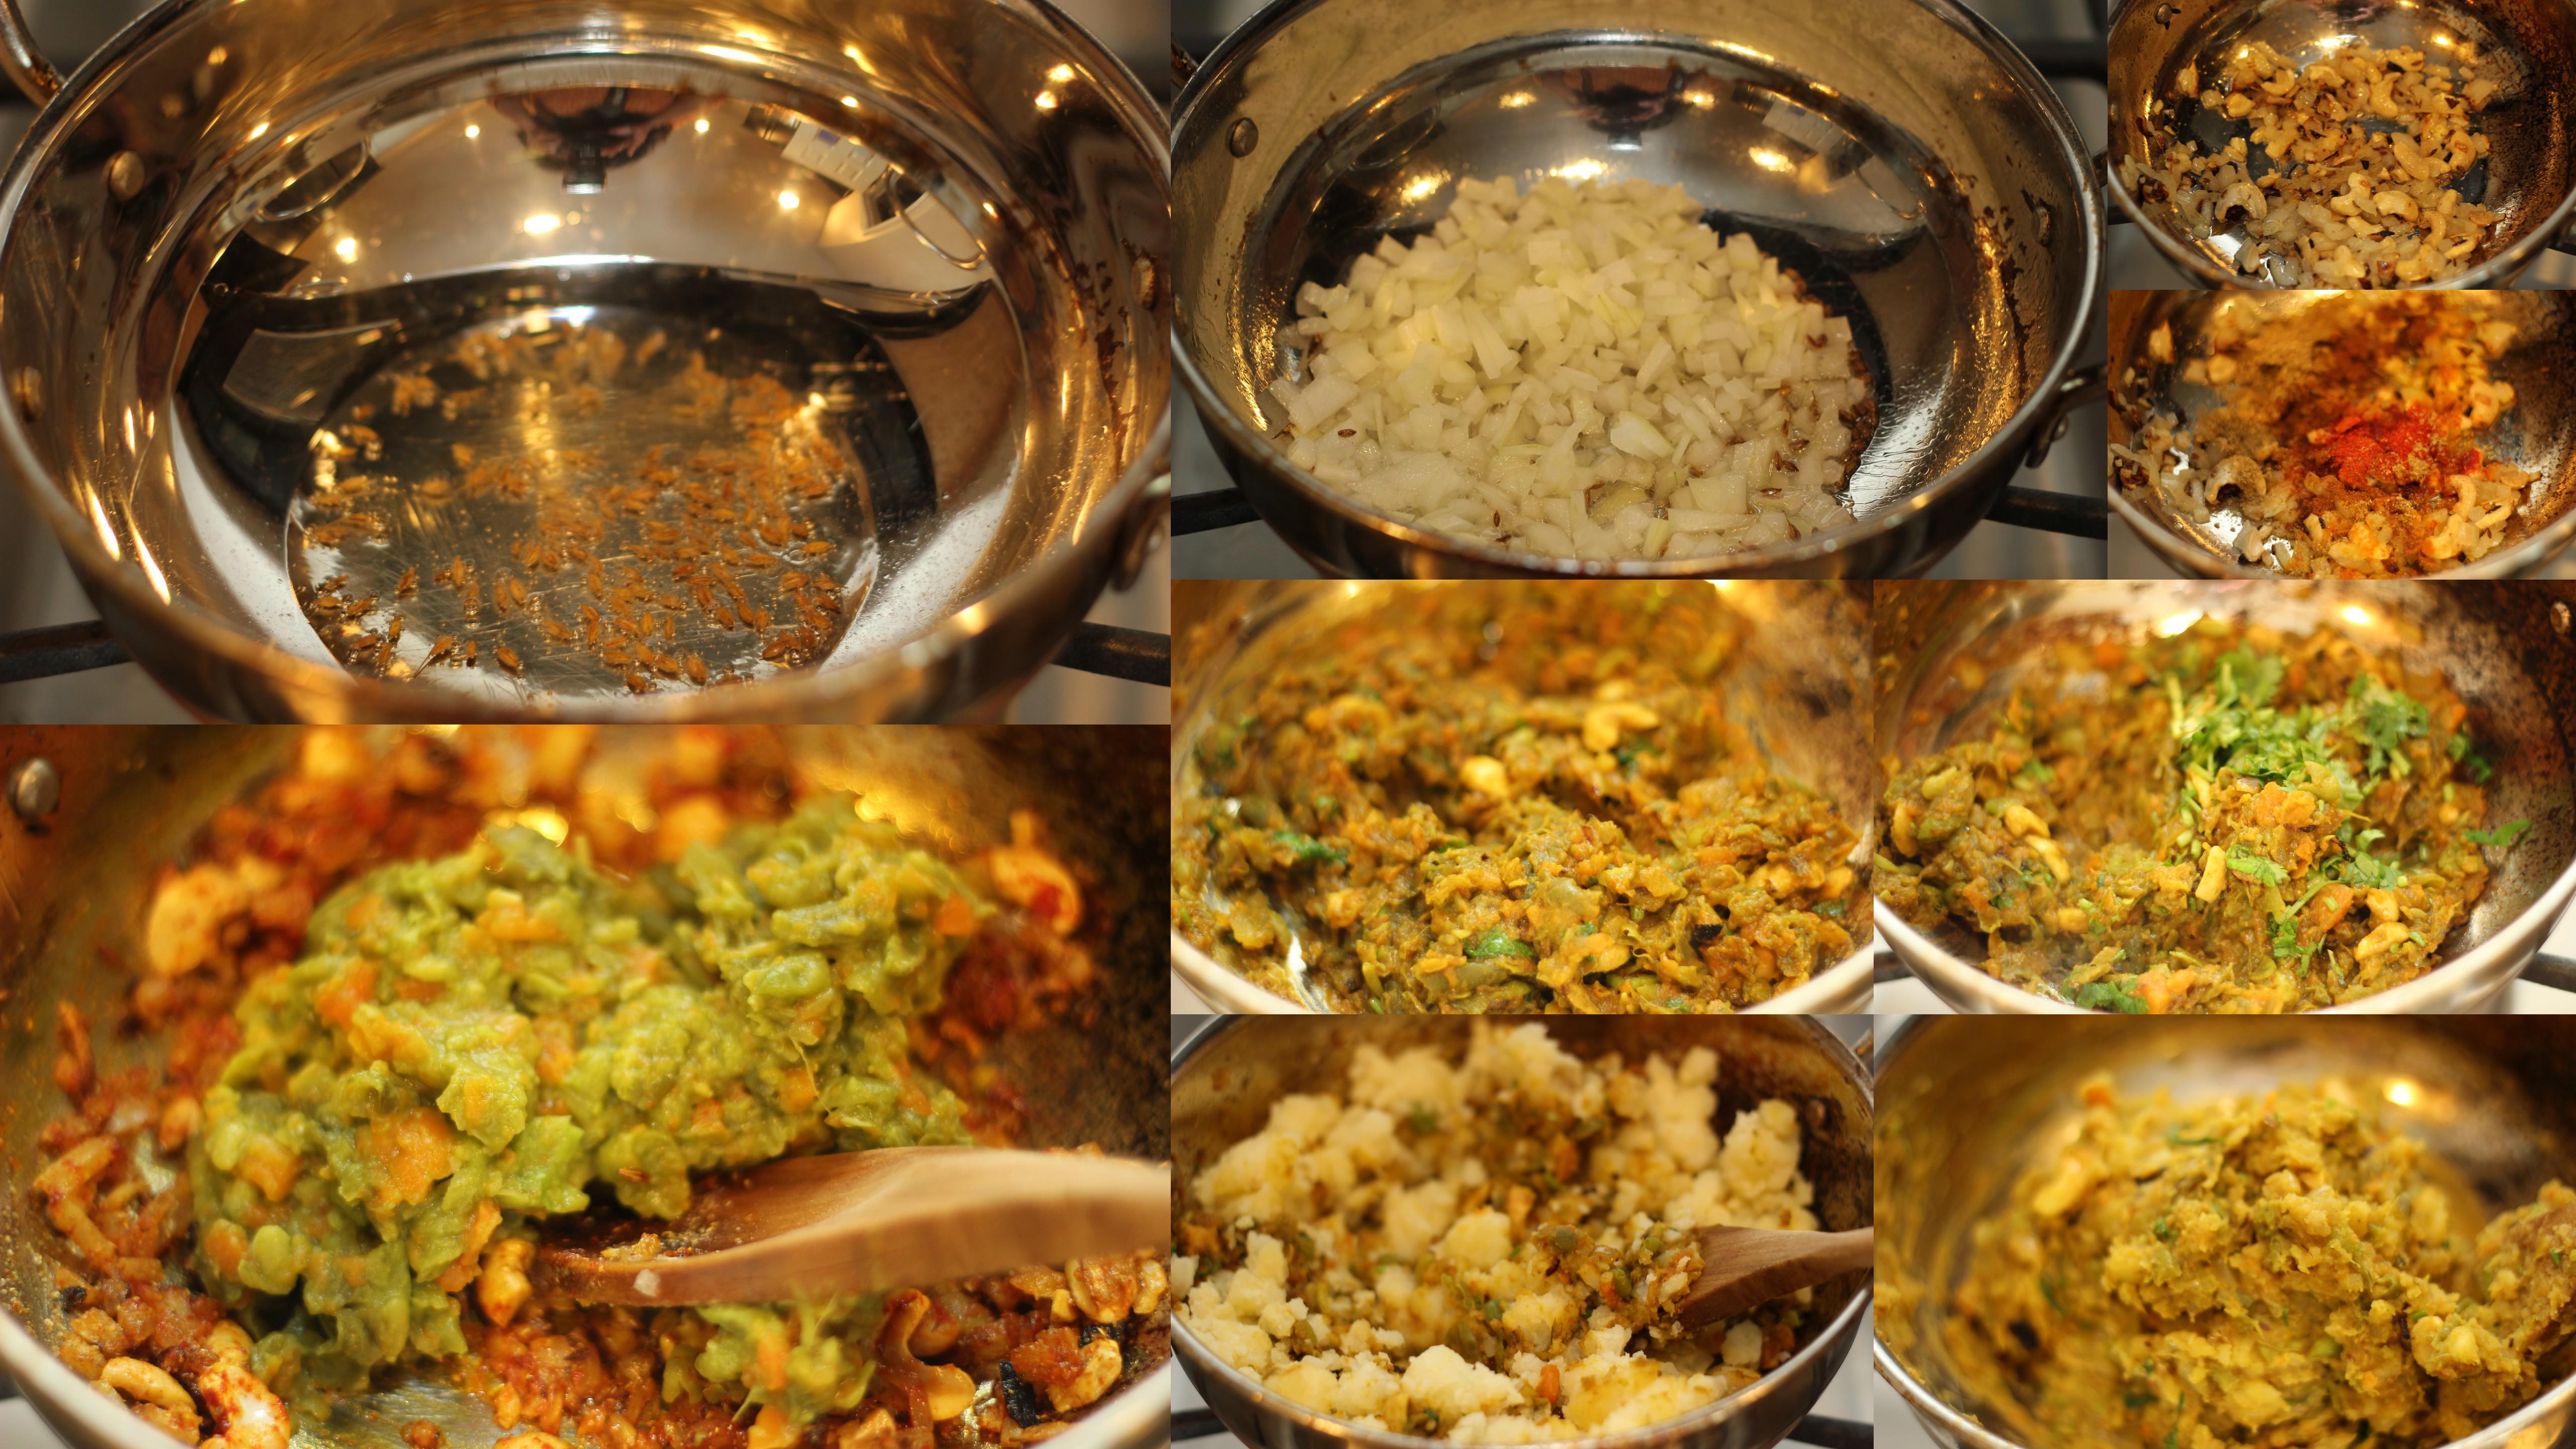 how to prepare veggies for goldfish